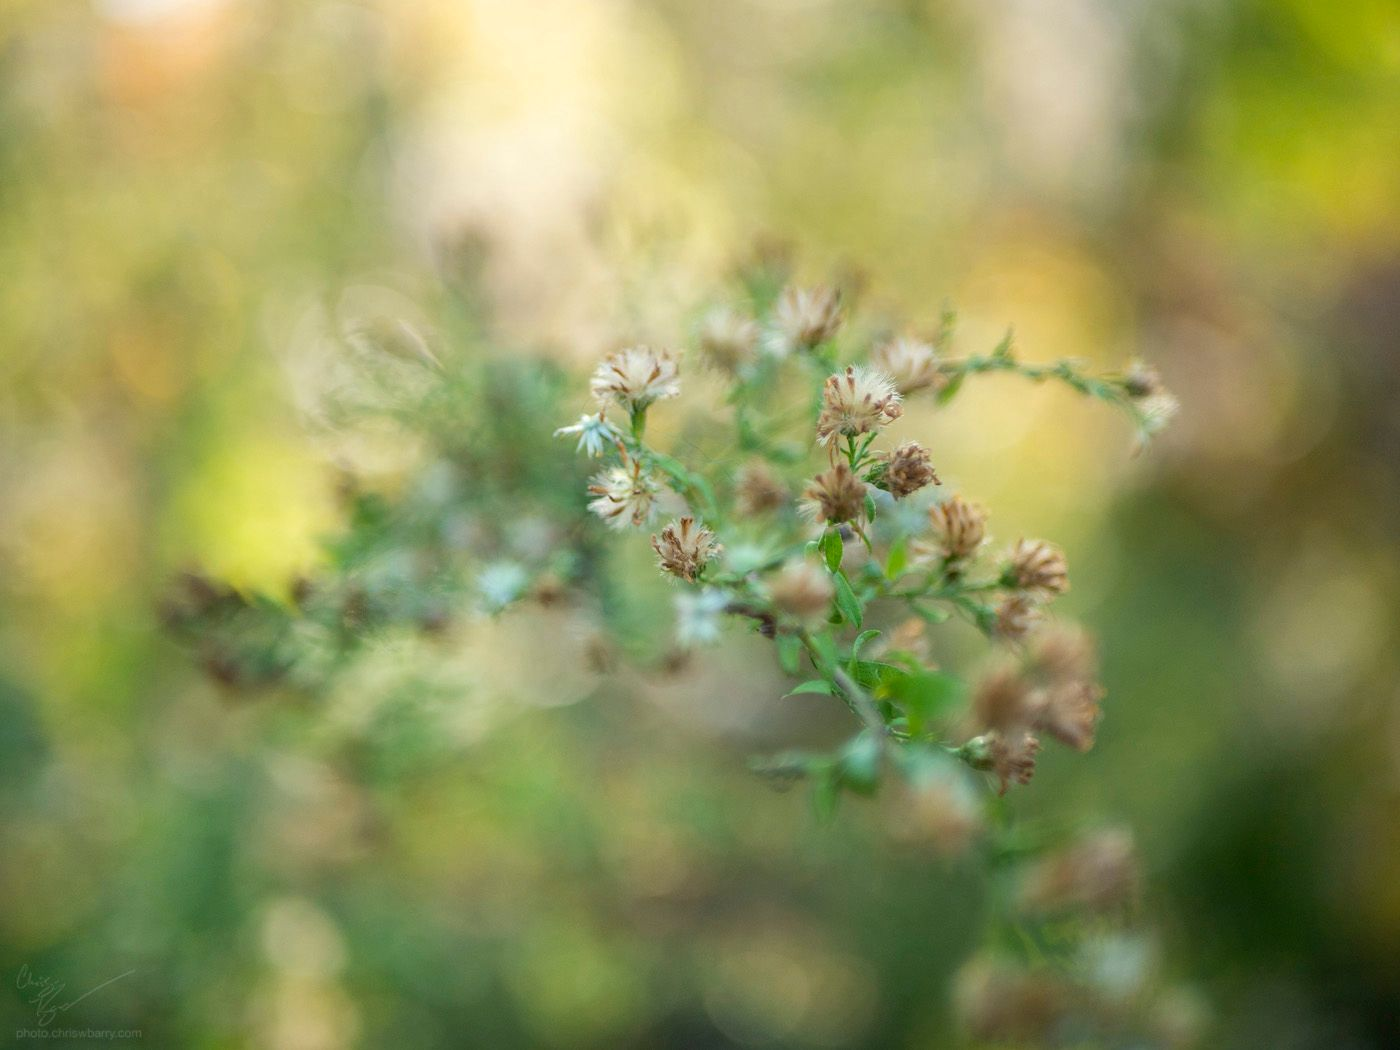 11-04-2020: Fluffy Seeds